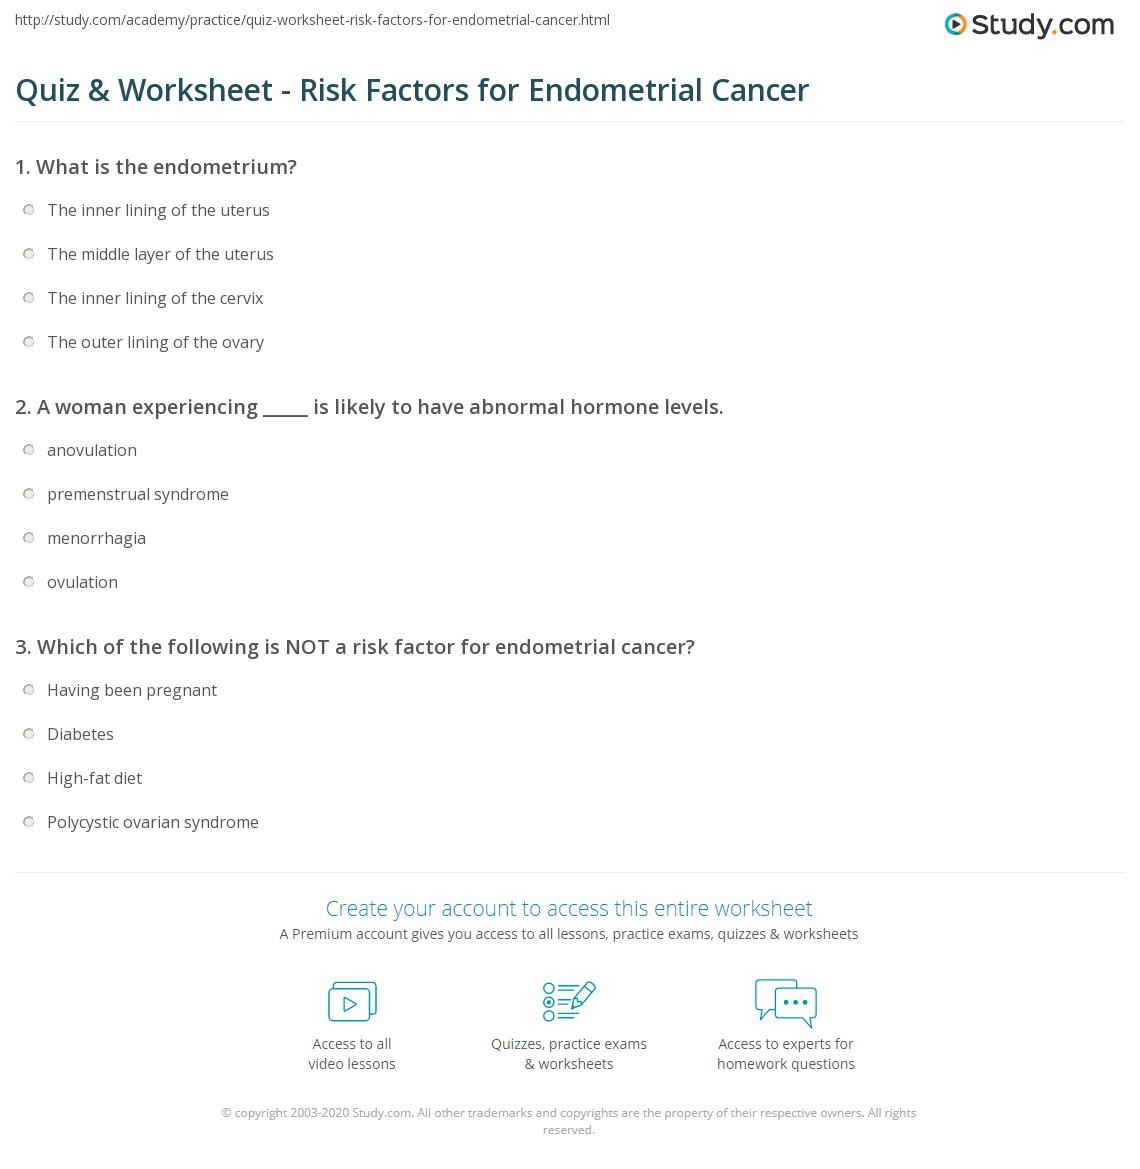 What is the endometrium